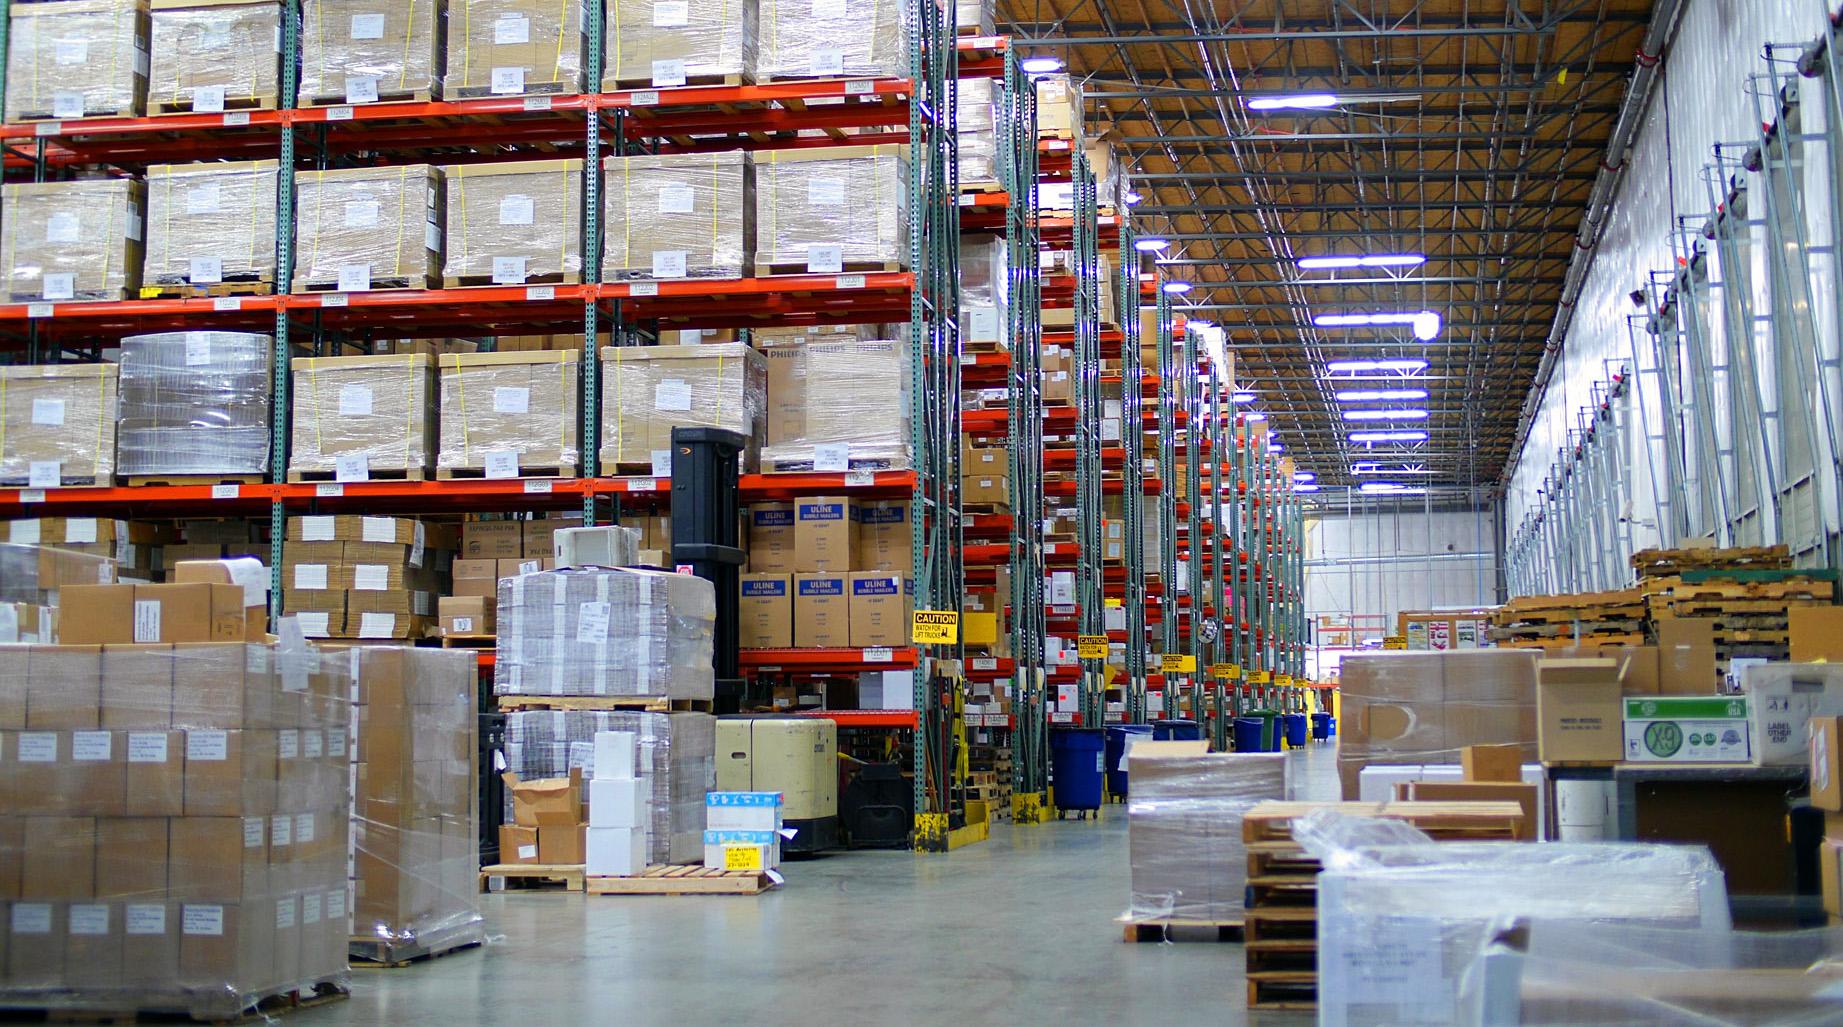 Kaye-Smith Warehouse Boxes Packages Shelves Racks